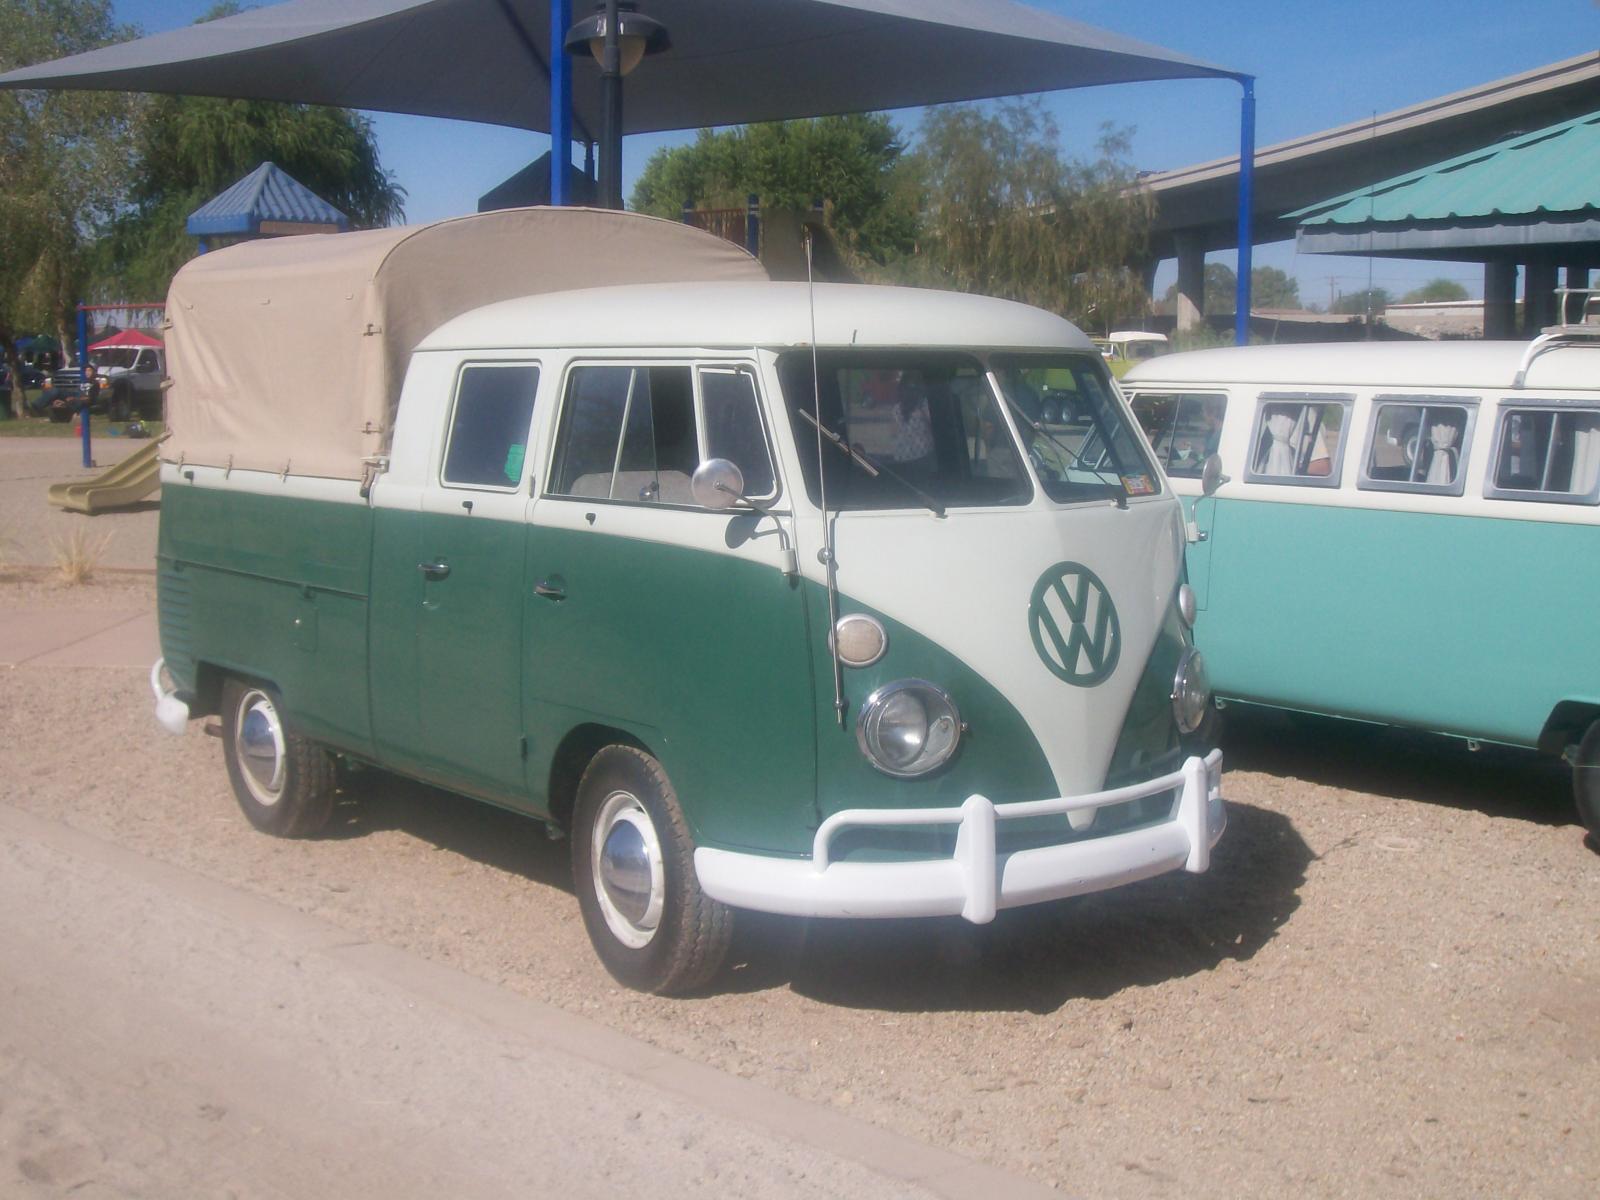 VW on the River Yuma 2012